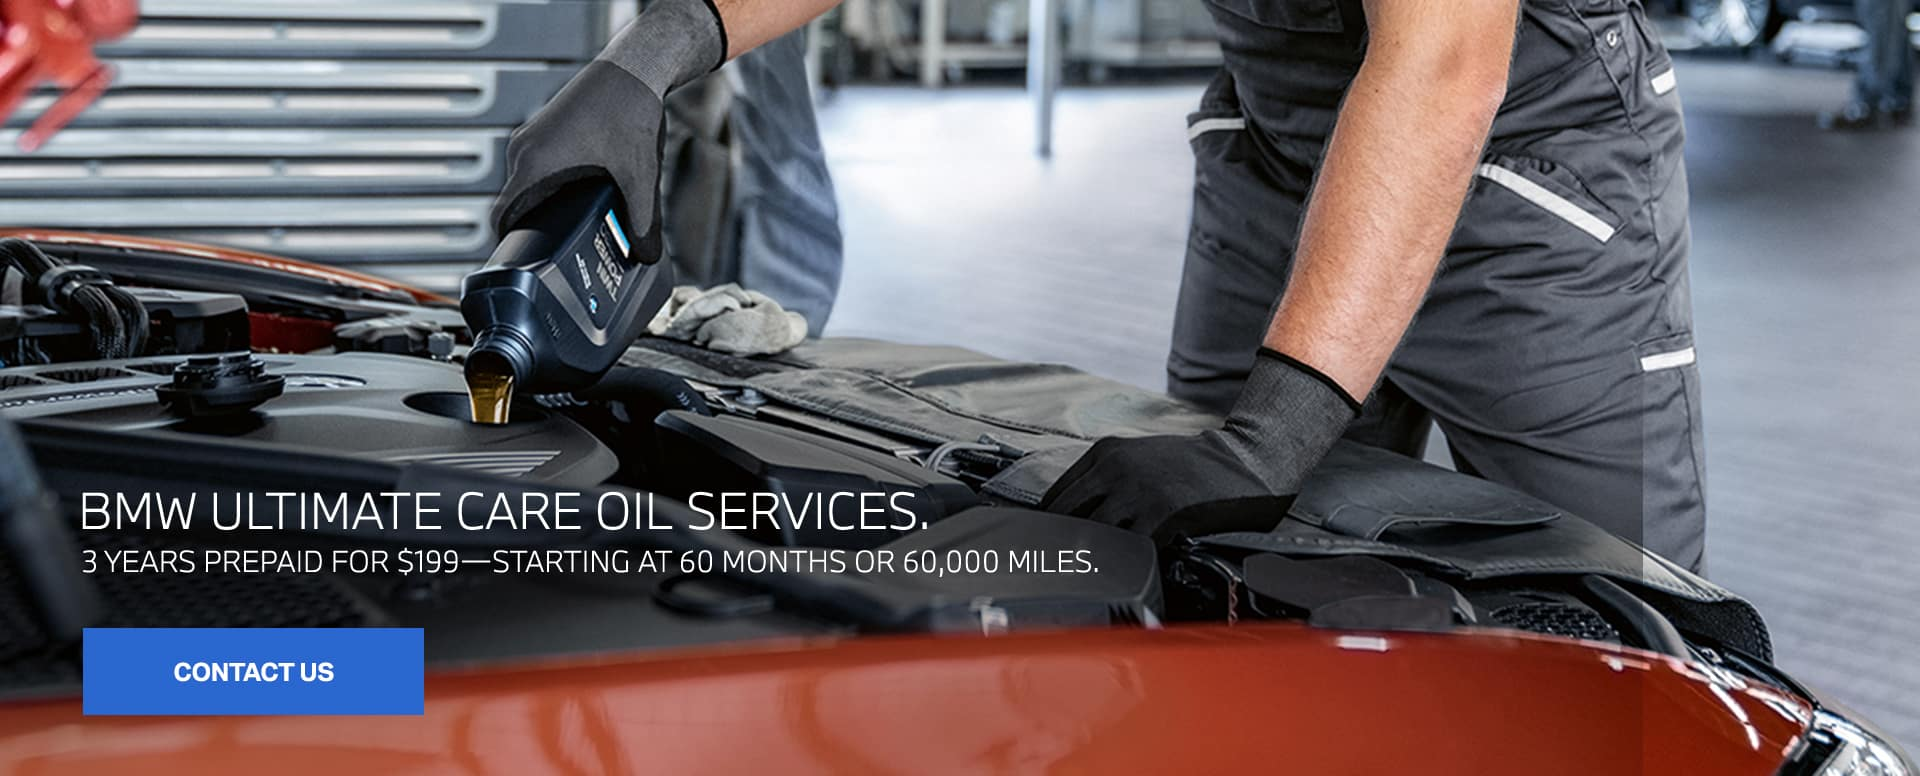 BMW Ultimate Oil Care Service